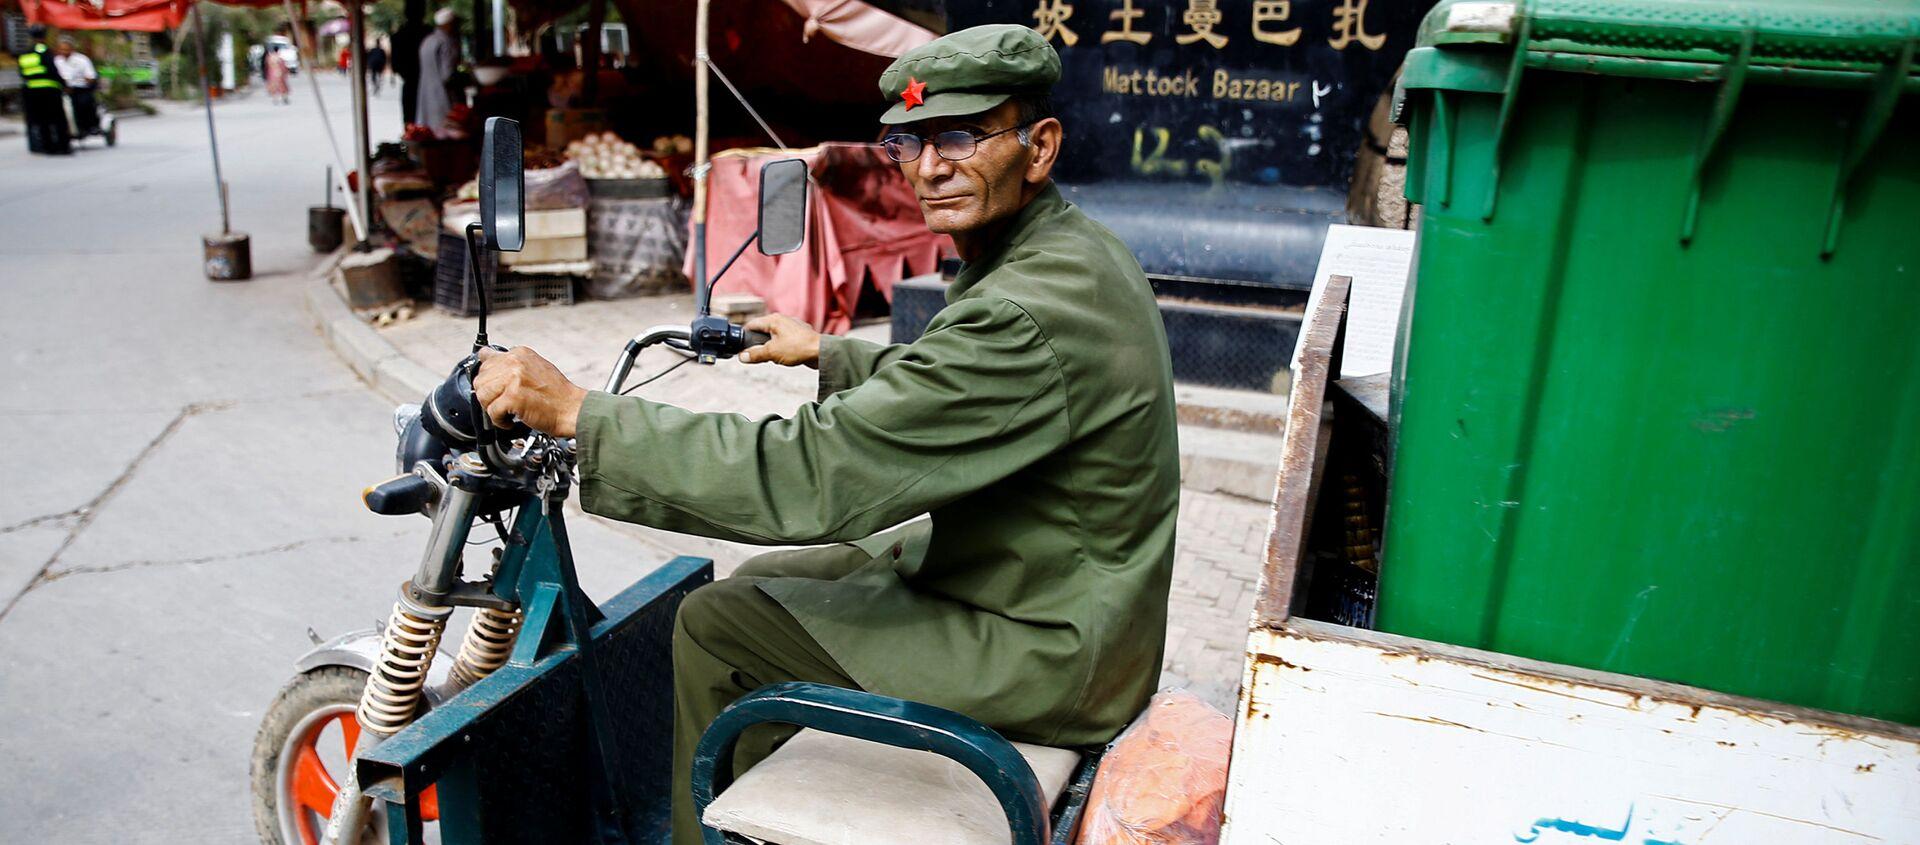 La Cina musulmana - Sputnik Italia, 1920, 03.12.2018